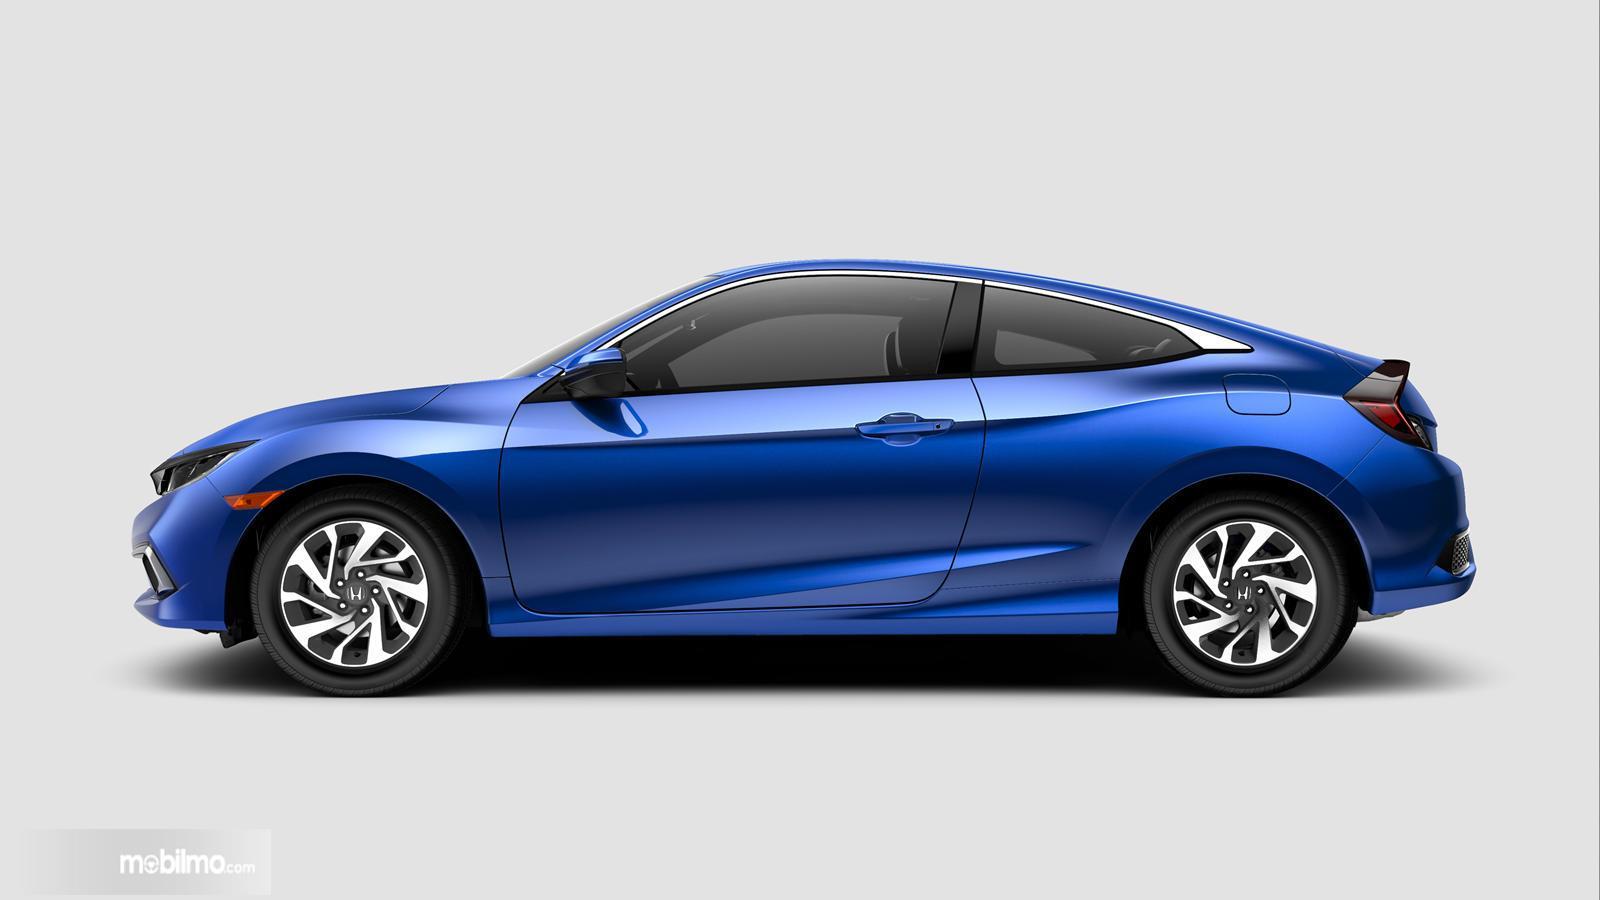 Gambar tampilan samping Honda Civic 2019